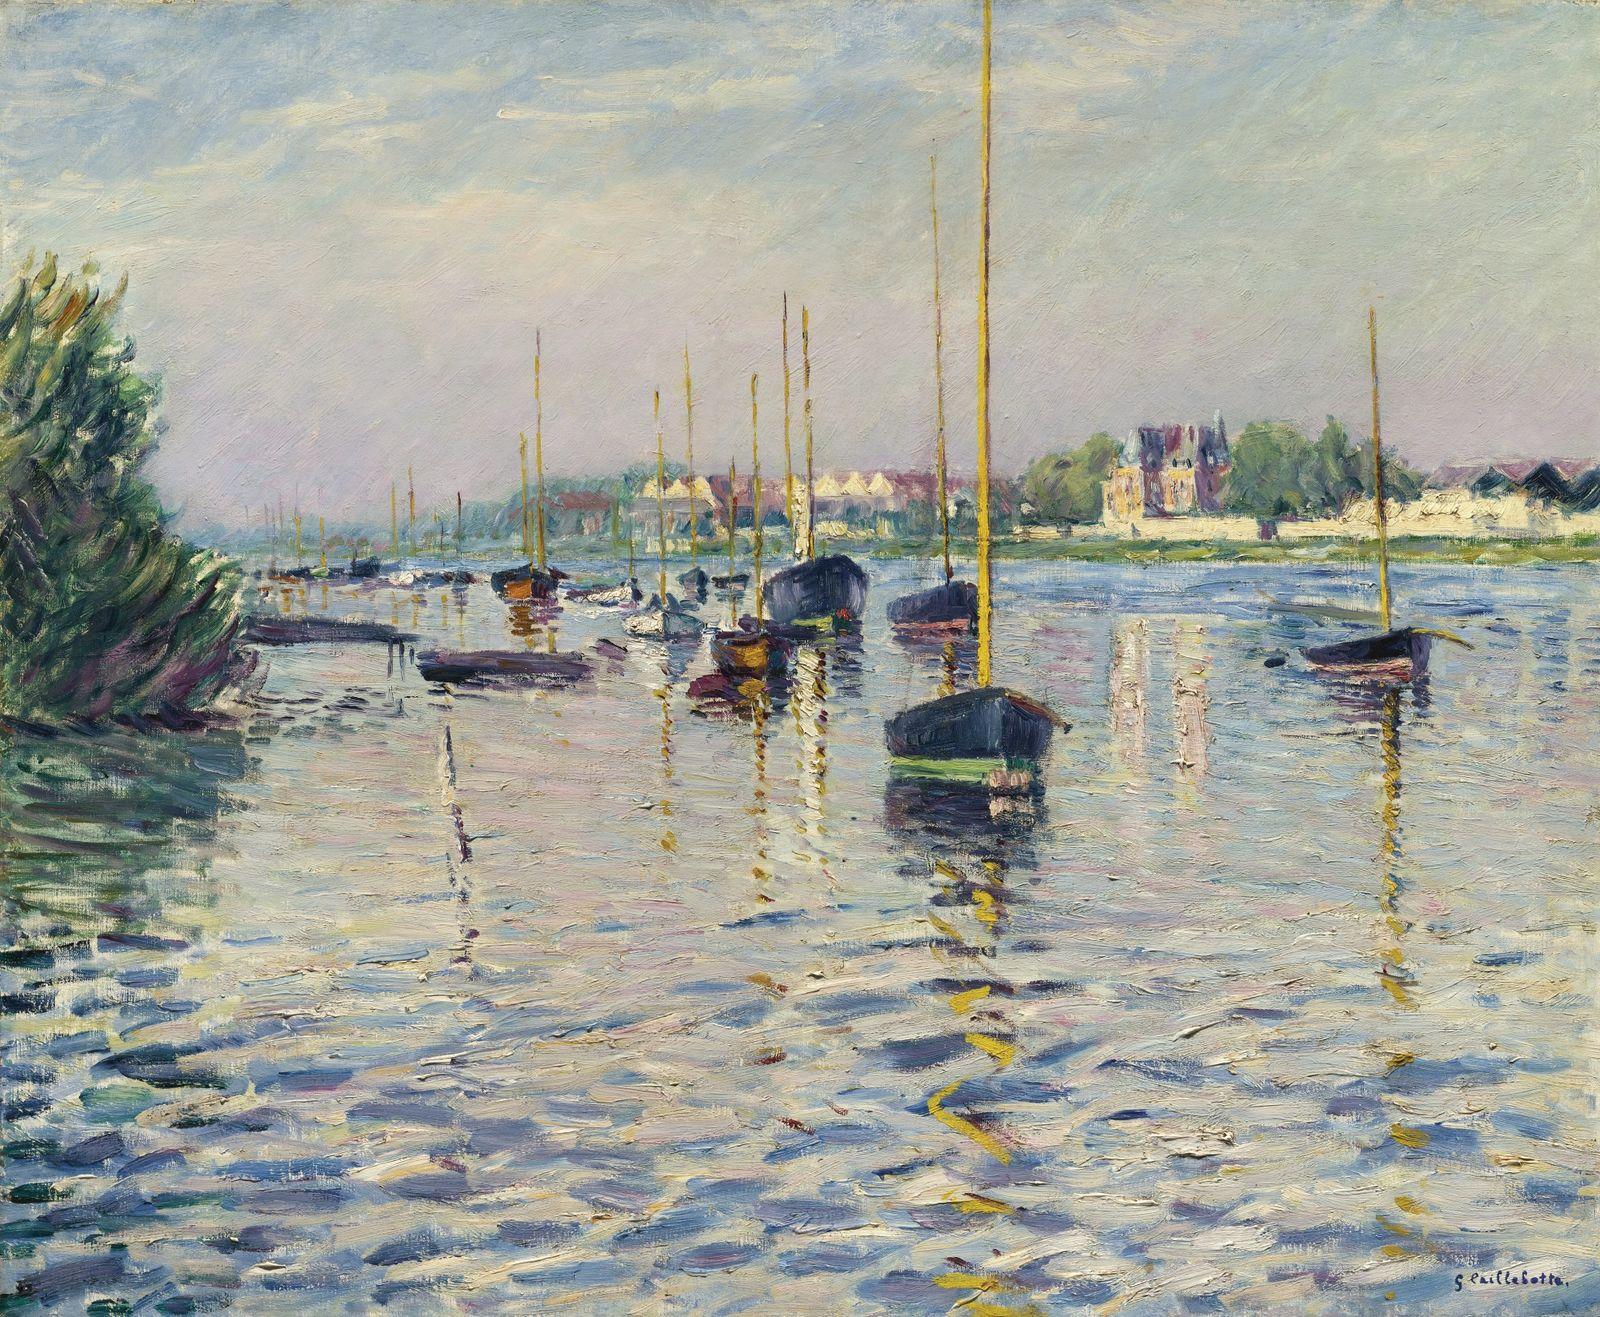 Гюстав Кайботт «Лодки на якоре на Сене в Аржантей», (1892 60 x 73.7 см ) частная коллекция